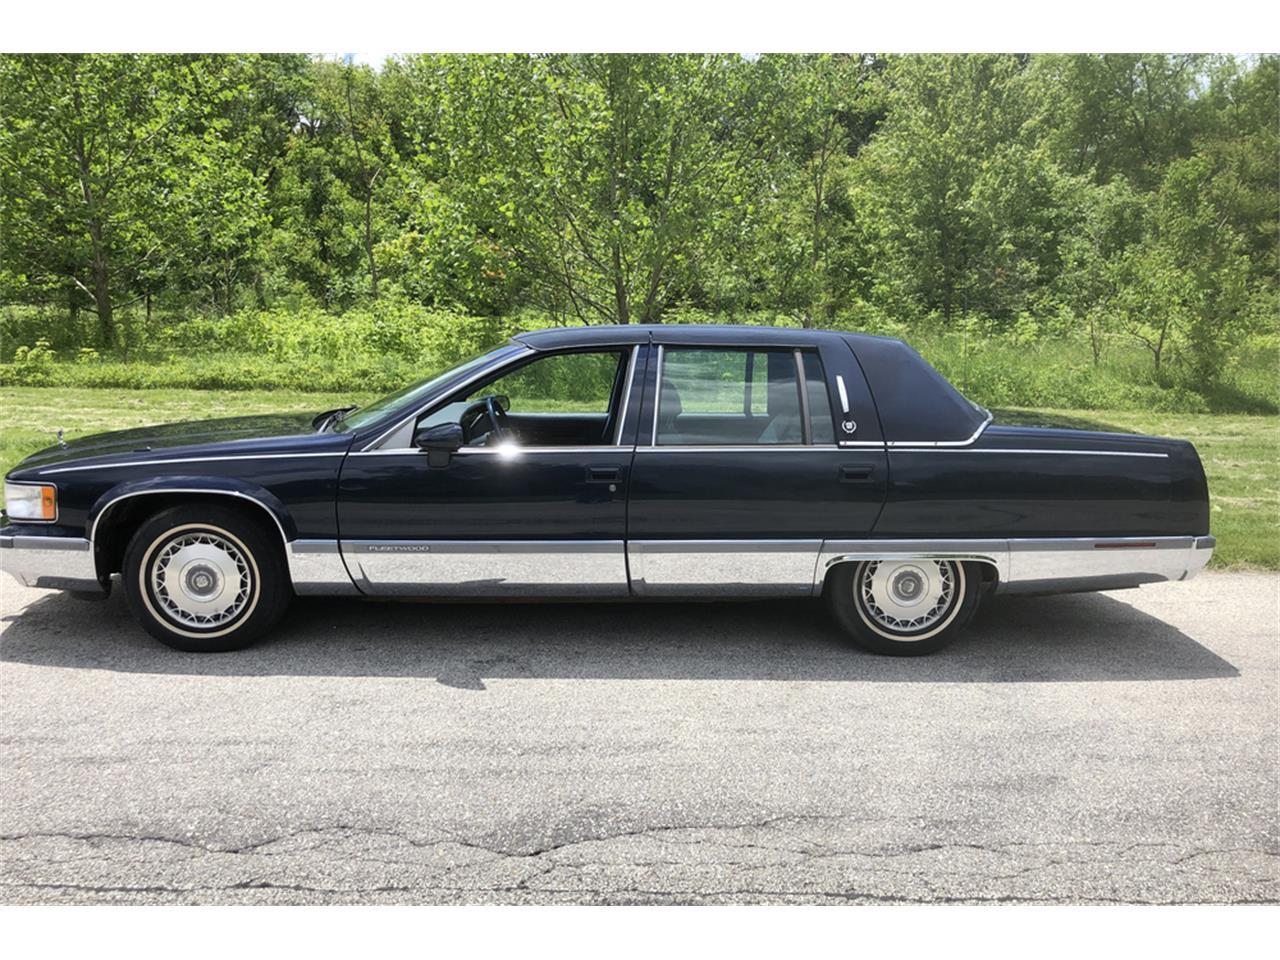 1993 Cadillac Fleetwood Brougham (CC-1229326) for sale in Uncasville, Connecticut